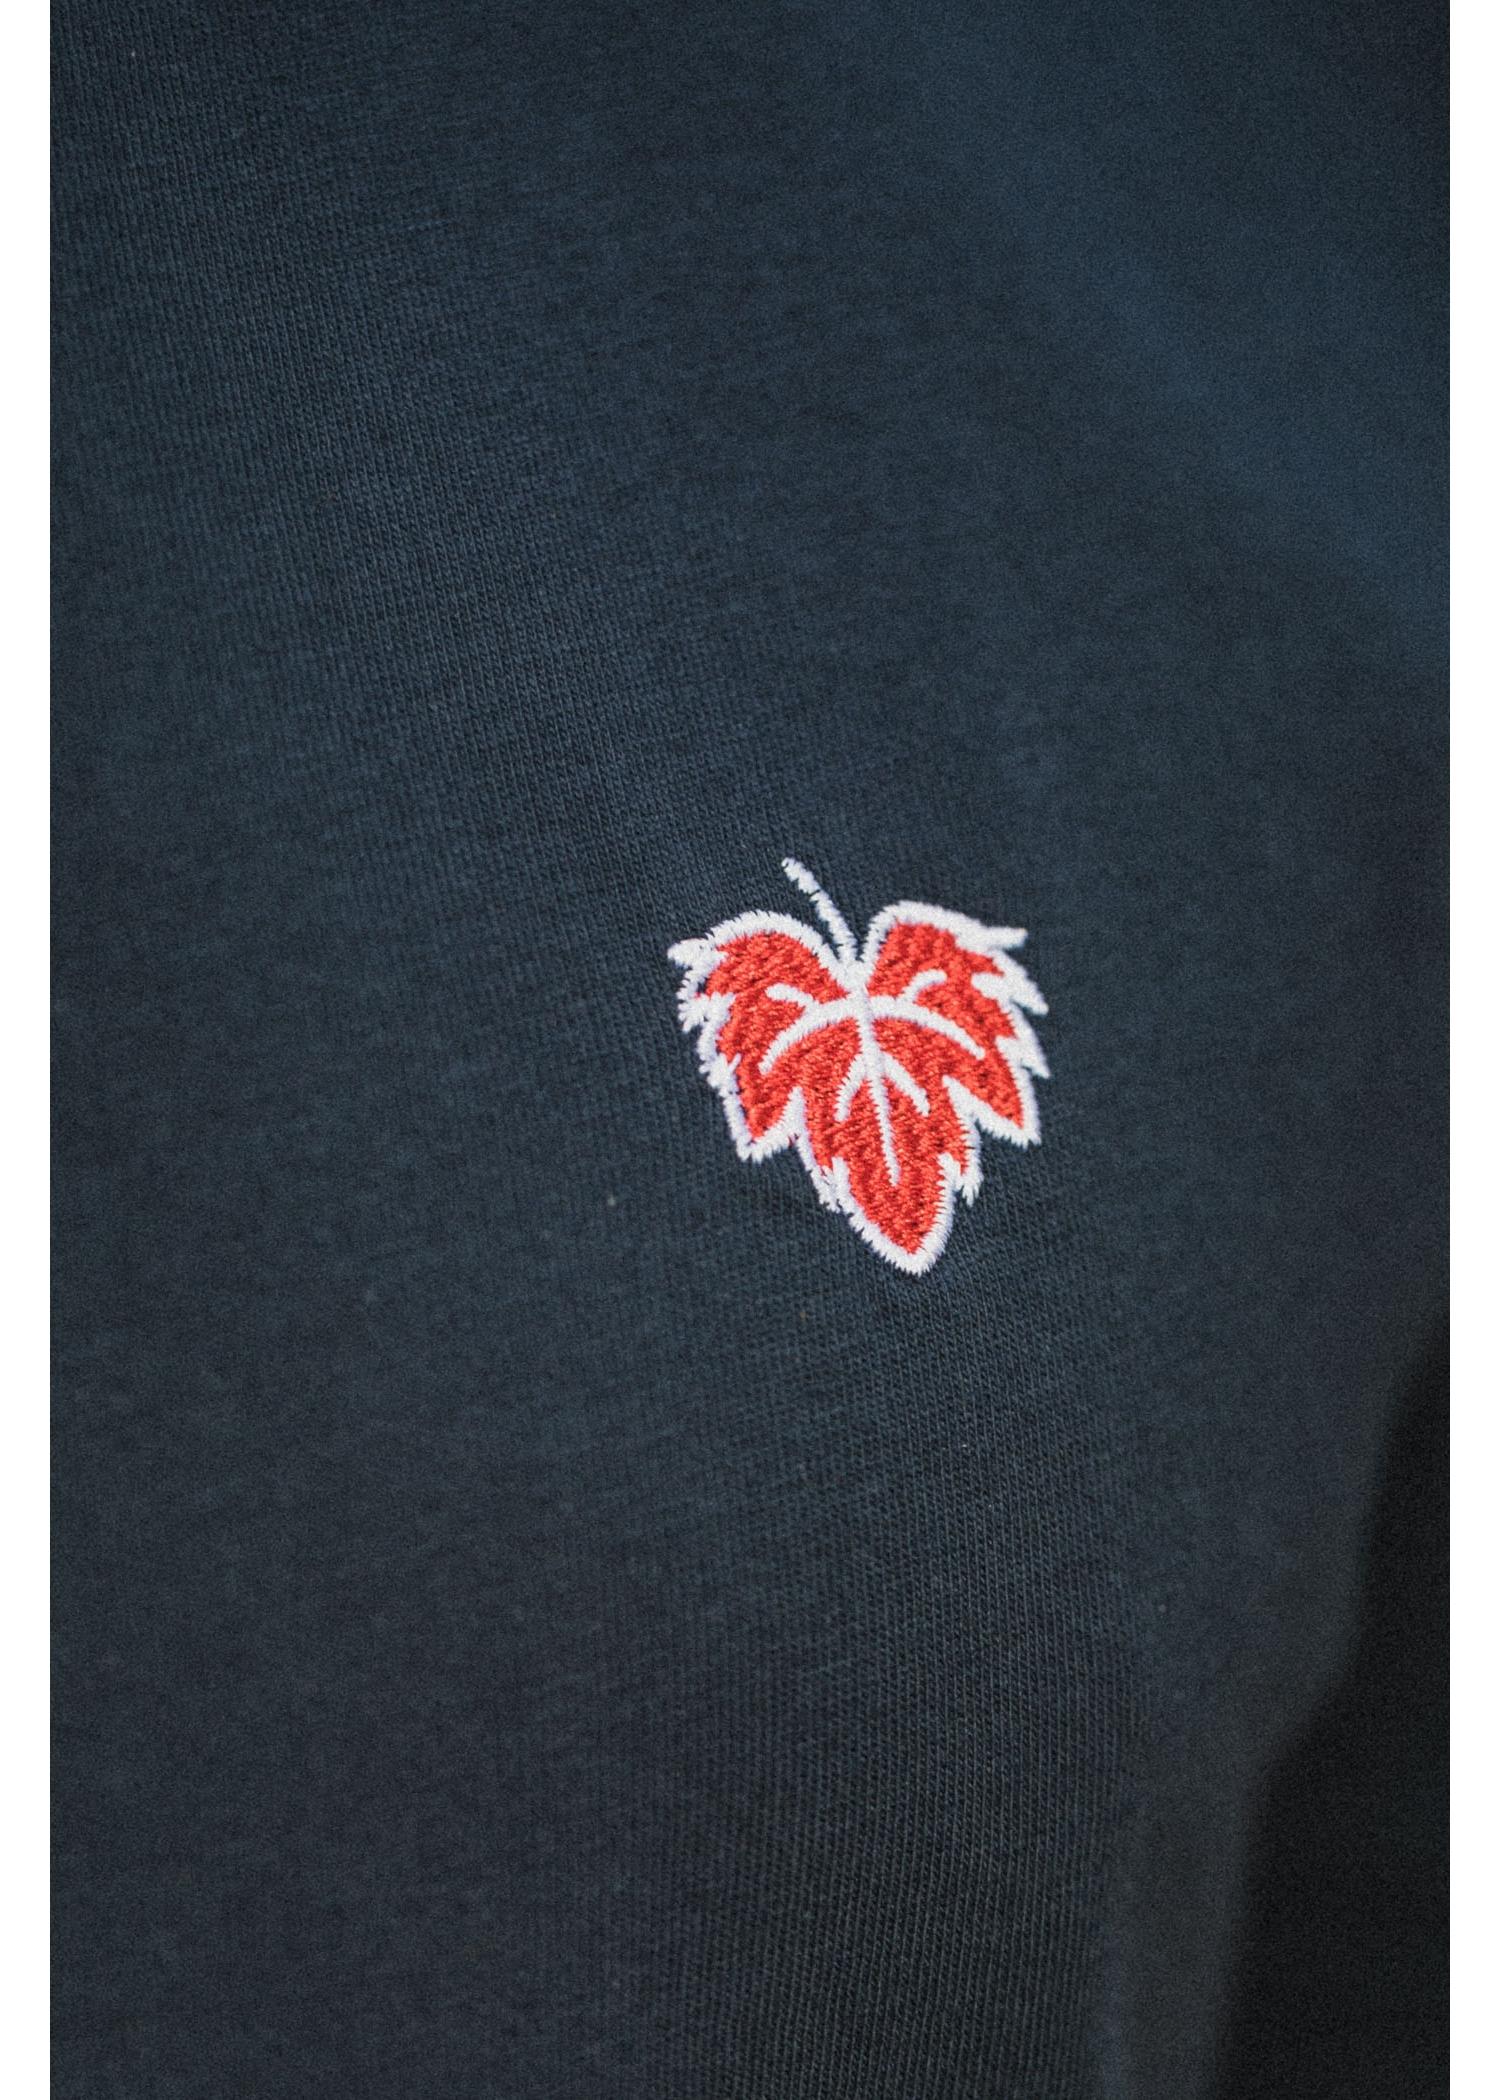 T-shirt Vigne Navy